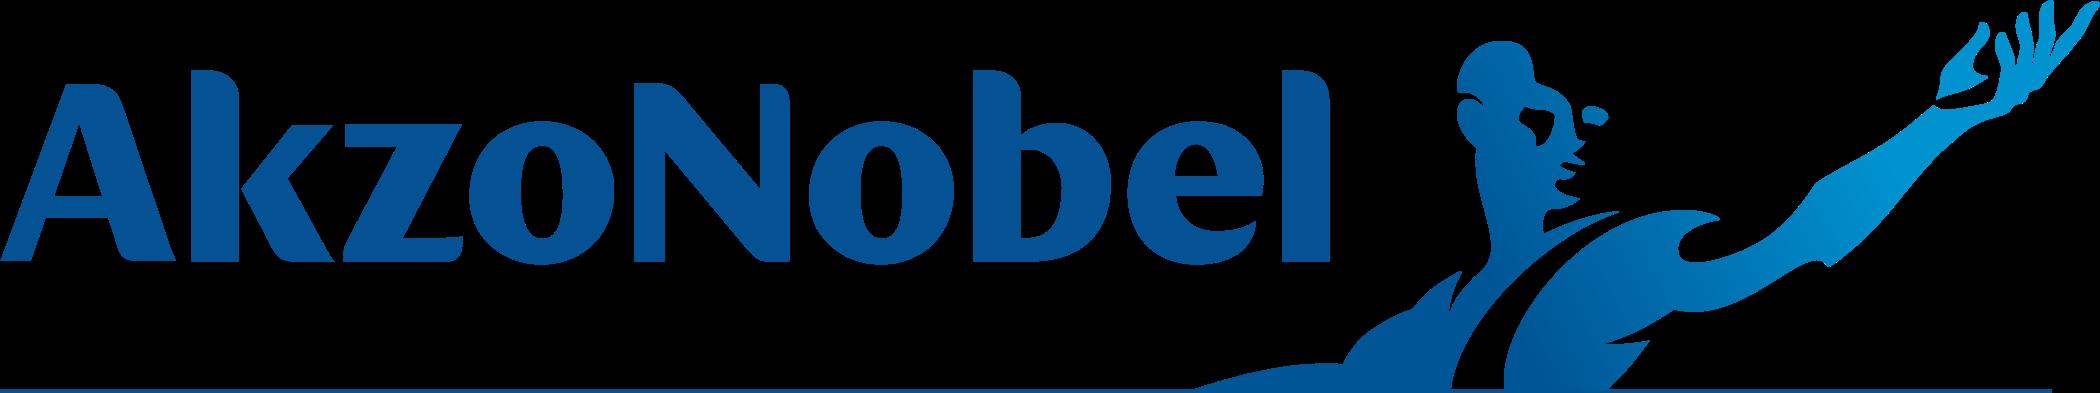 akzo nobel logo 2 - AkzoNobel Logo